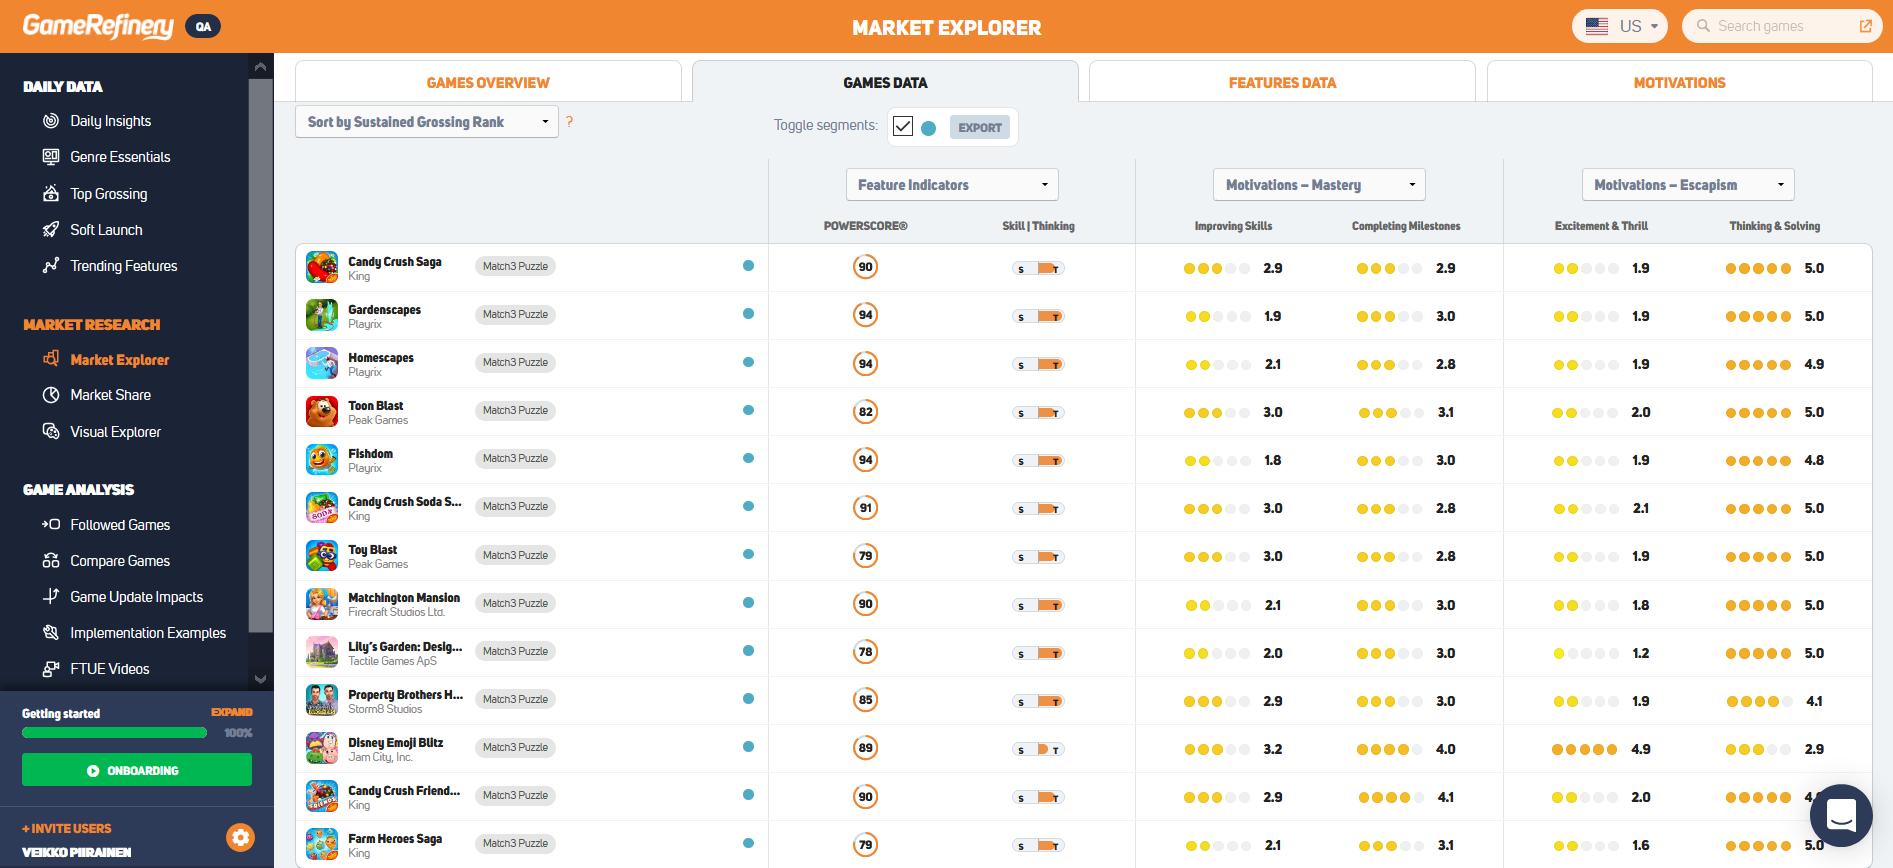 Game data in game market explorer GameRefinery